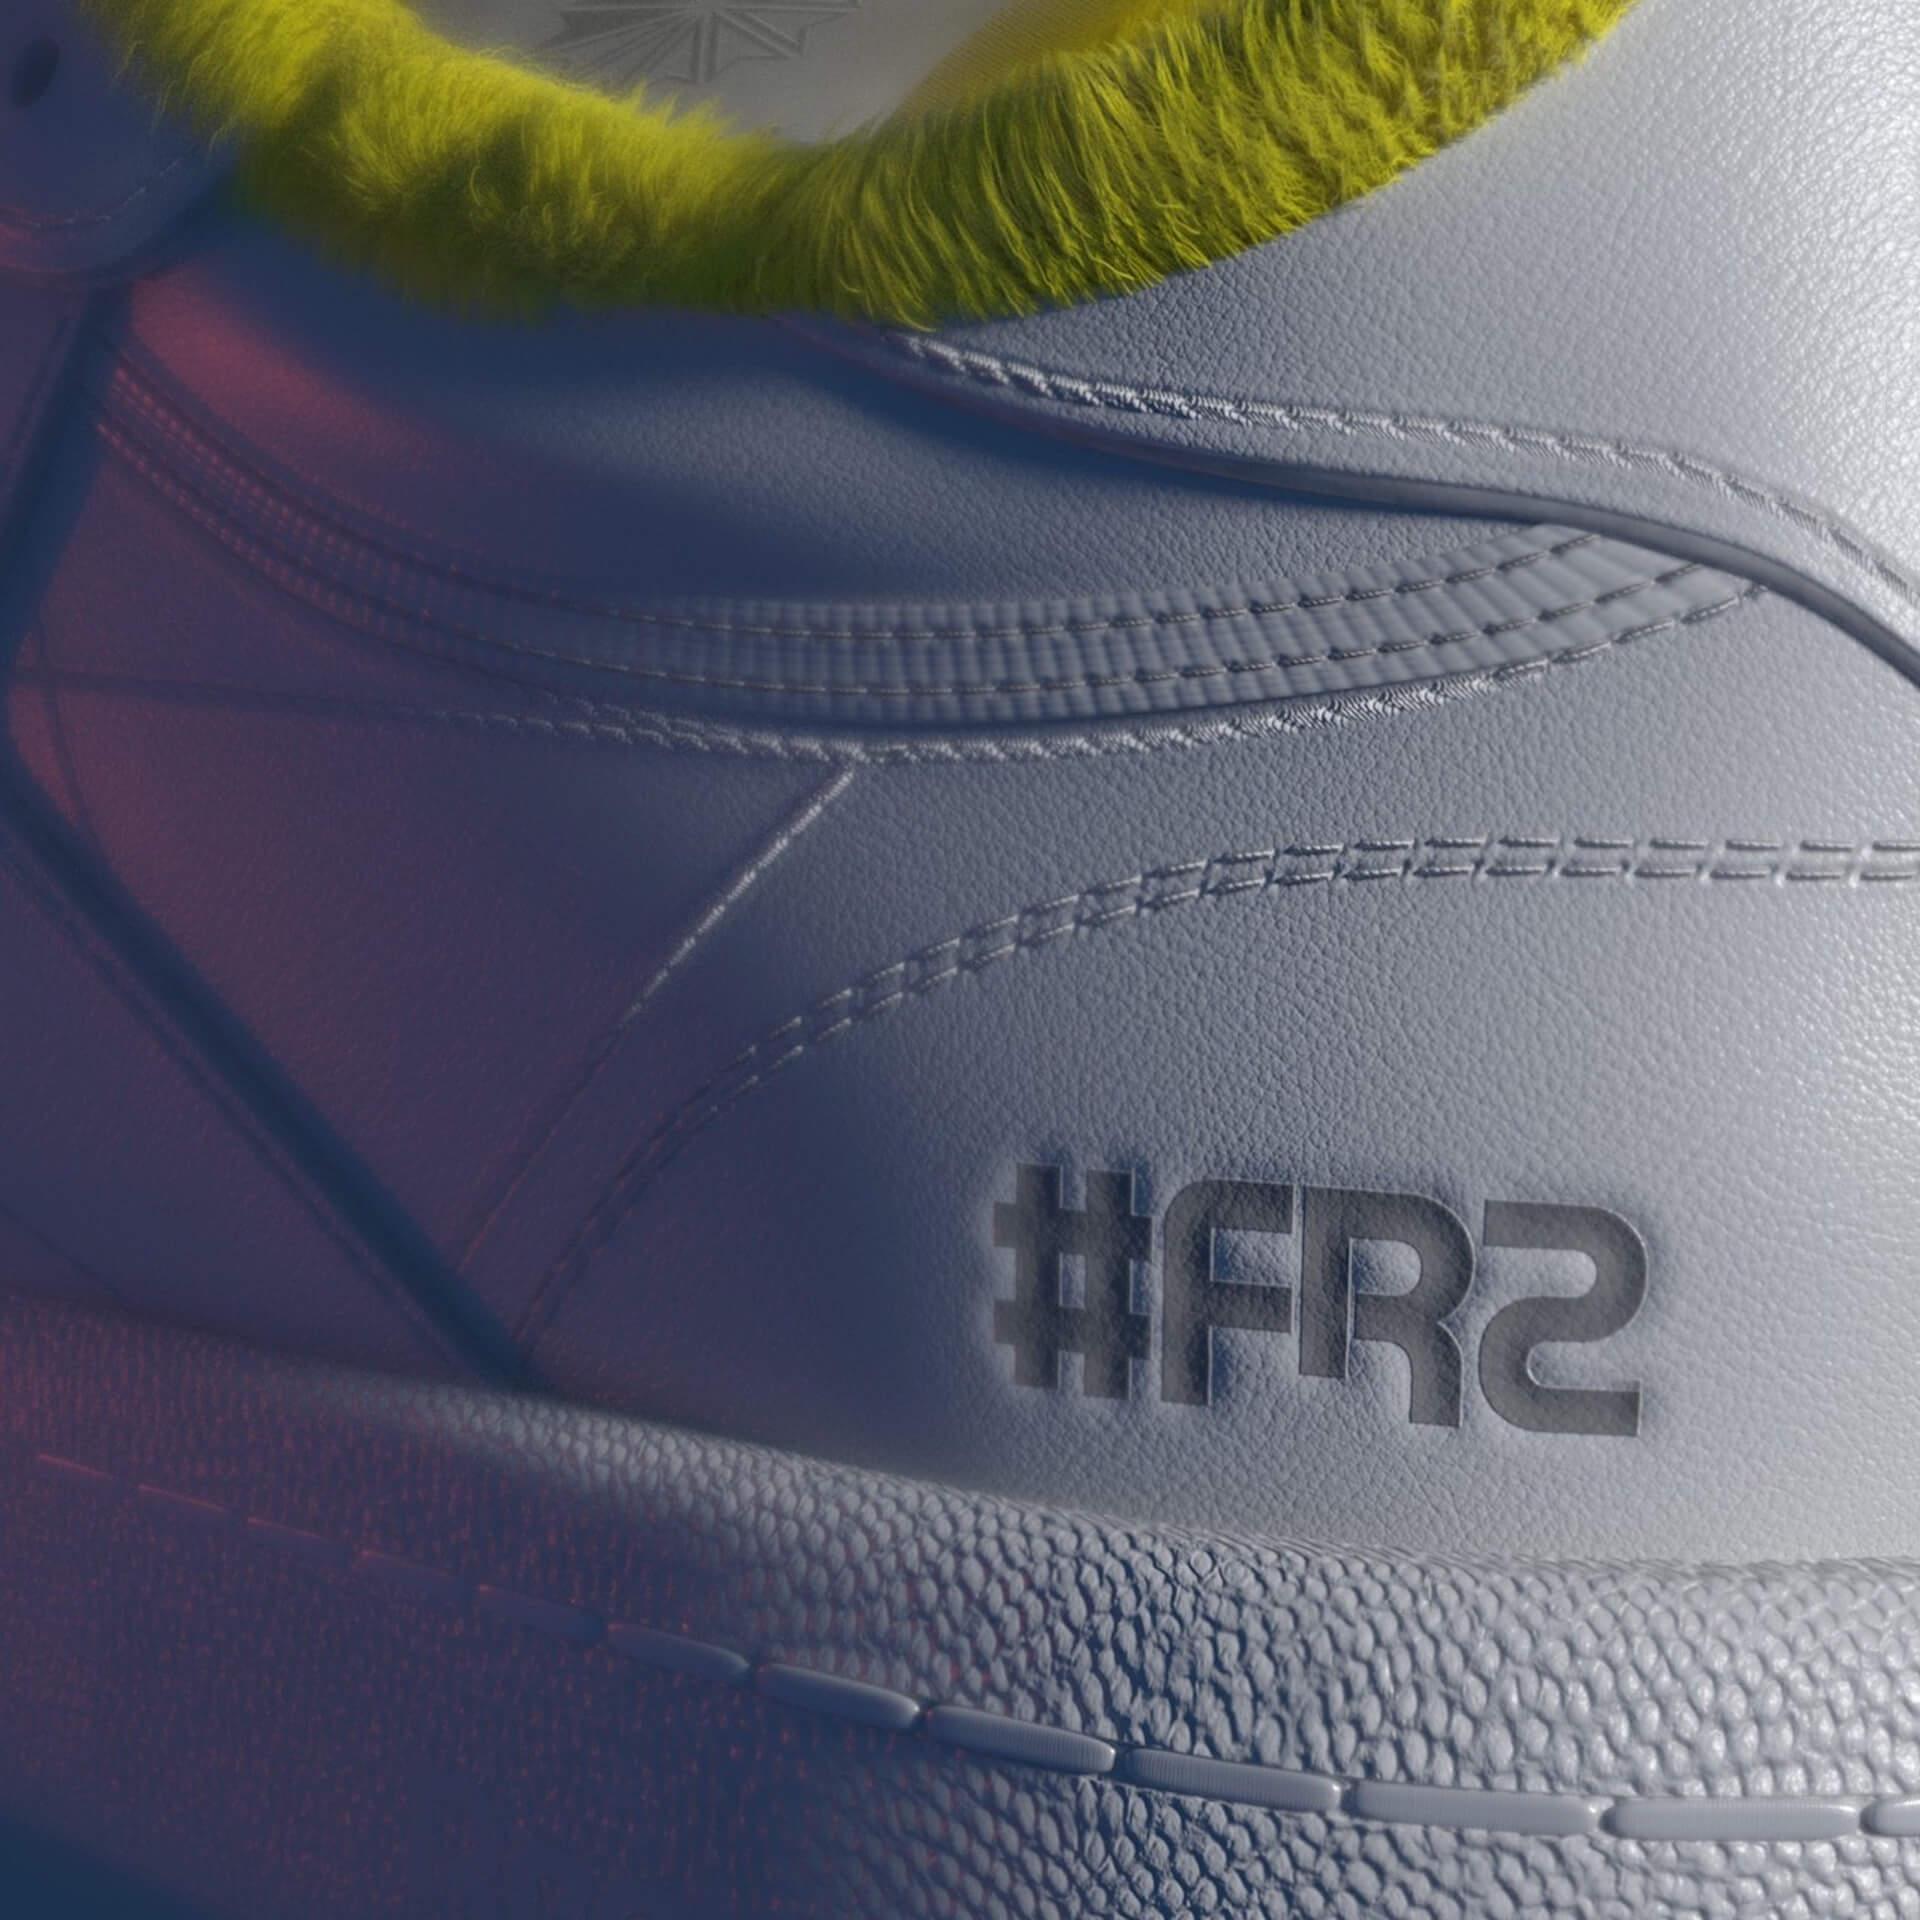 atmosと#FR2のコラボカプセルコレクションが発売!リーボック「CLUB C」ベースのスニーカーも登場 life210621_atmos_fr2_4